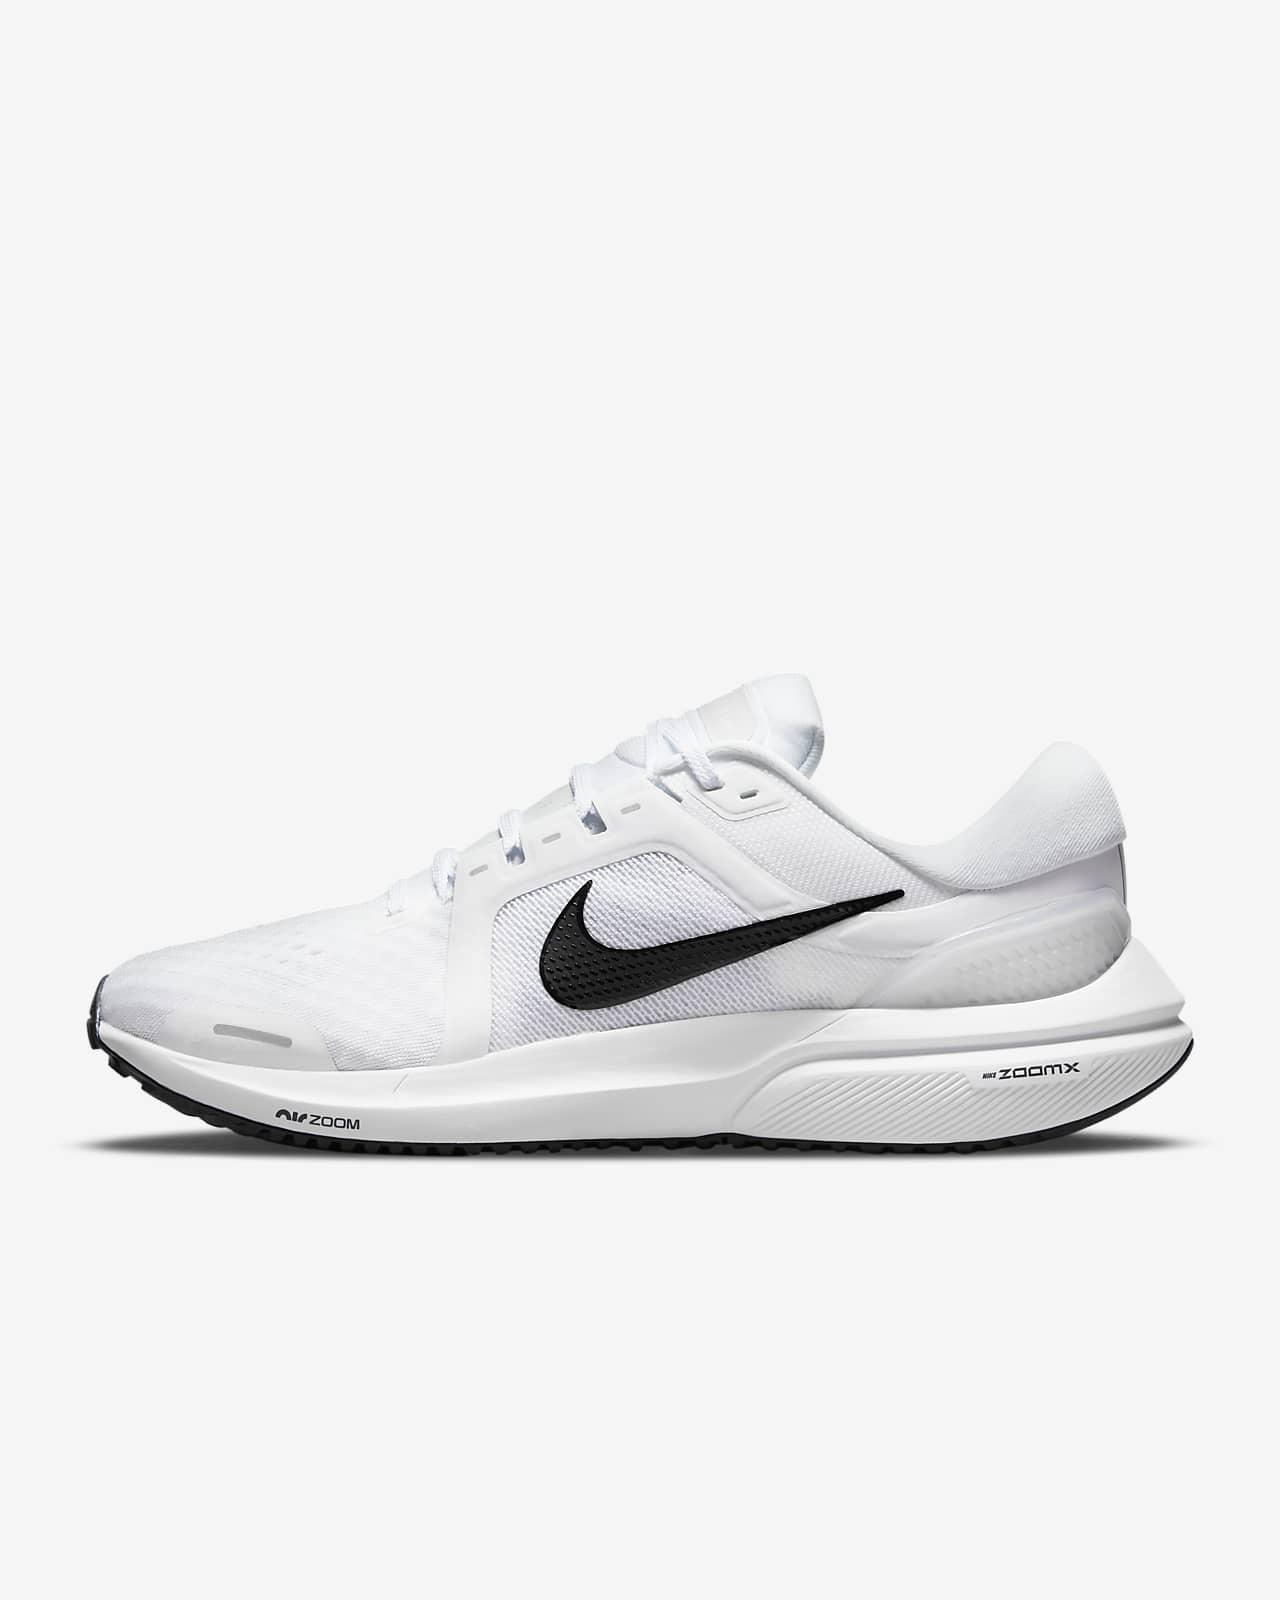 Chaussure de running sur route Nike Air Zoom Vomero 16 pour Homme